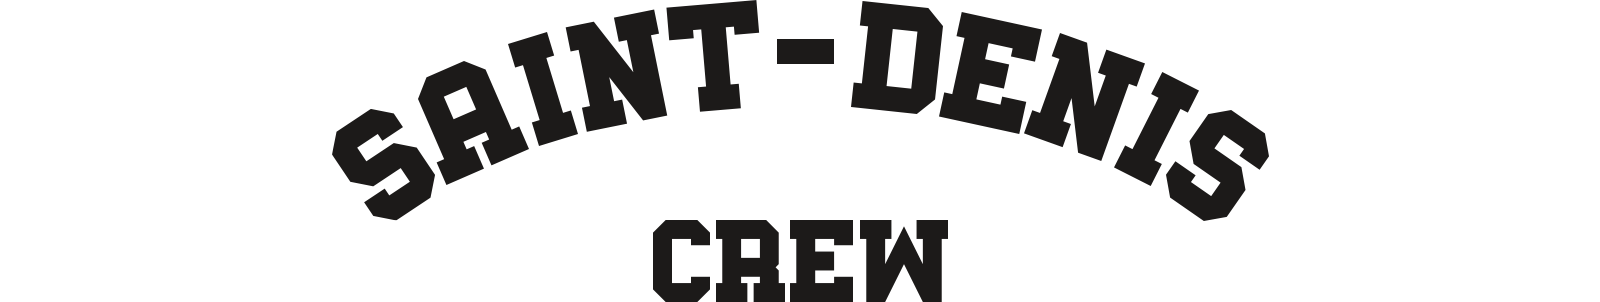 St denis crew logo